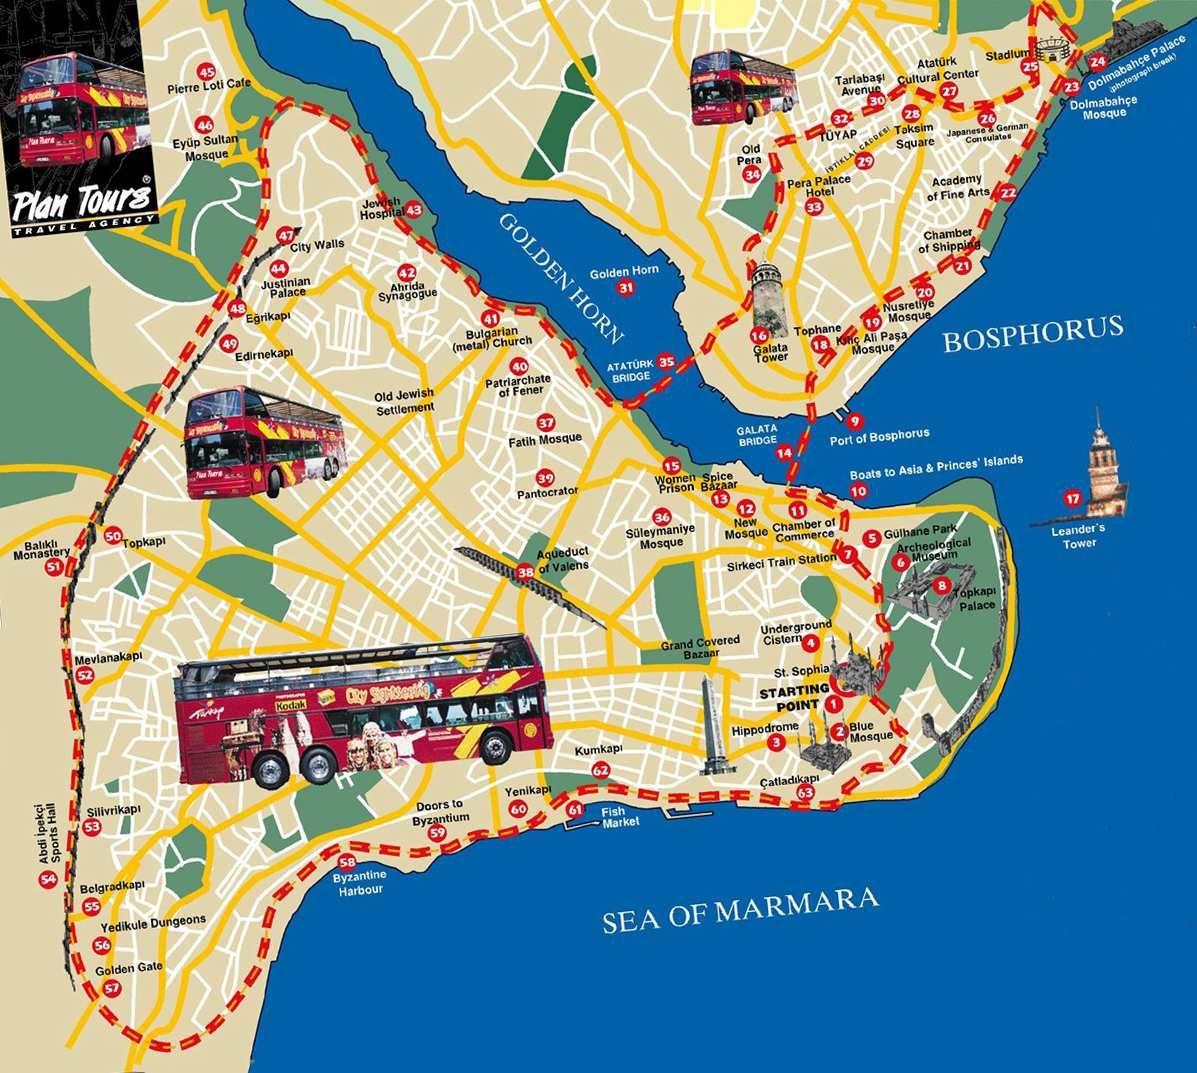 Grosse Karte Von Istanbul 5 Touristenkarte Istanbul Istanbul Turkei